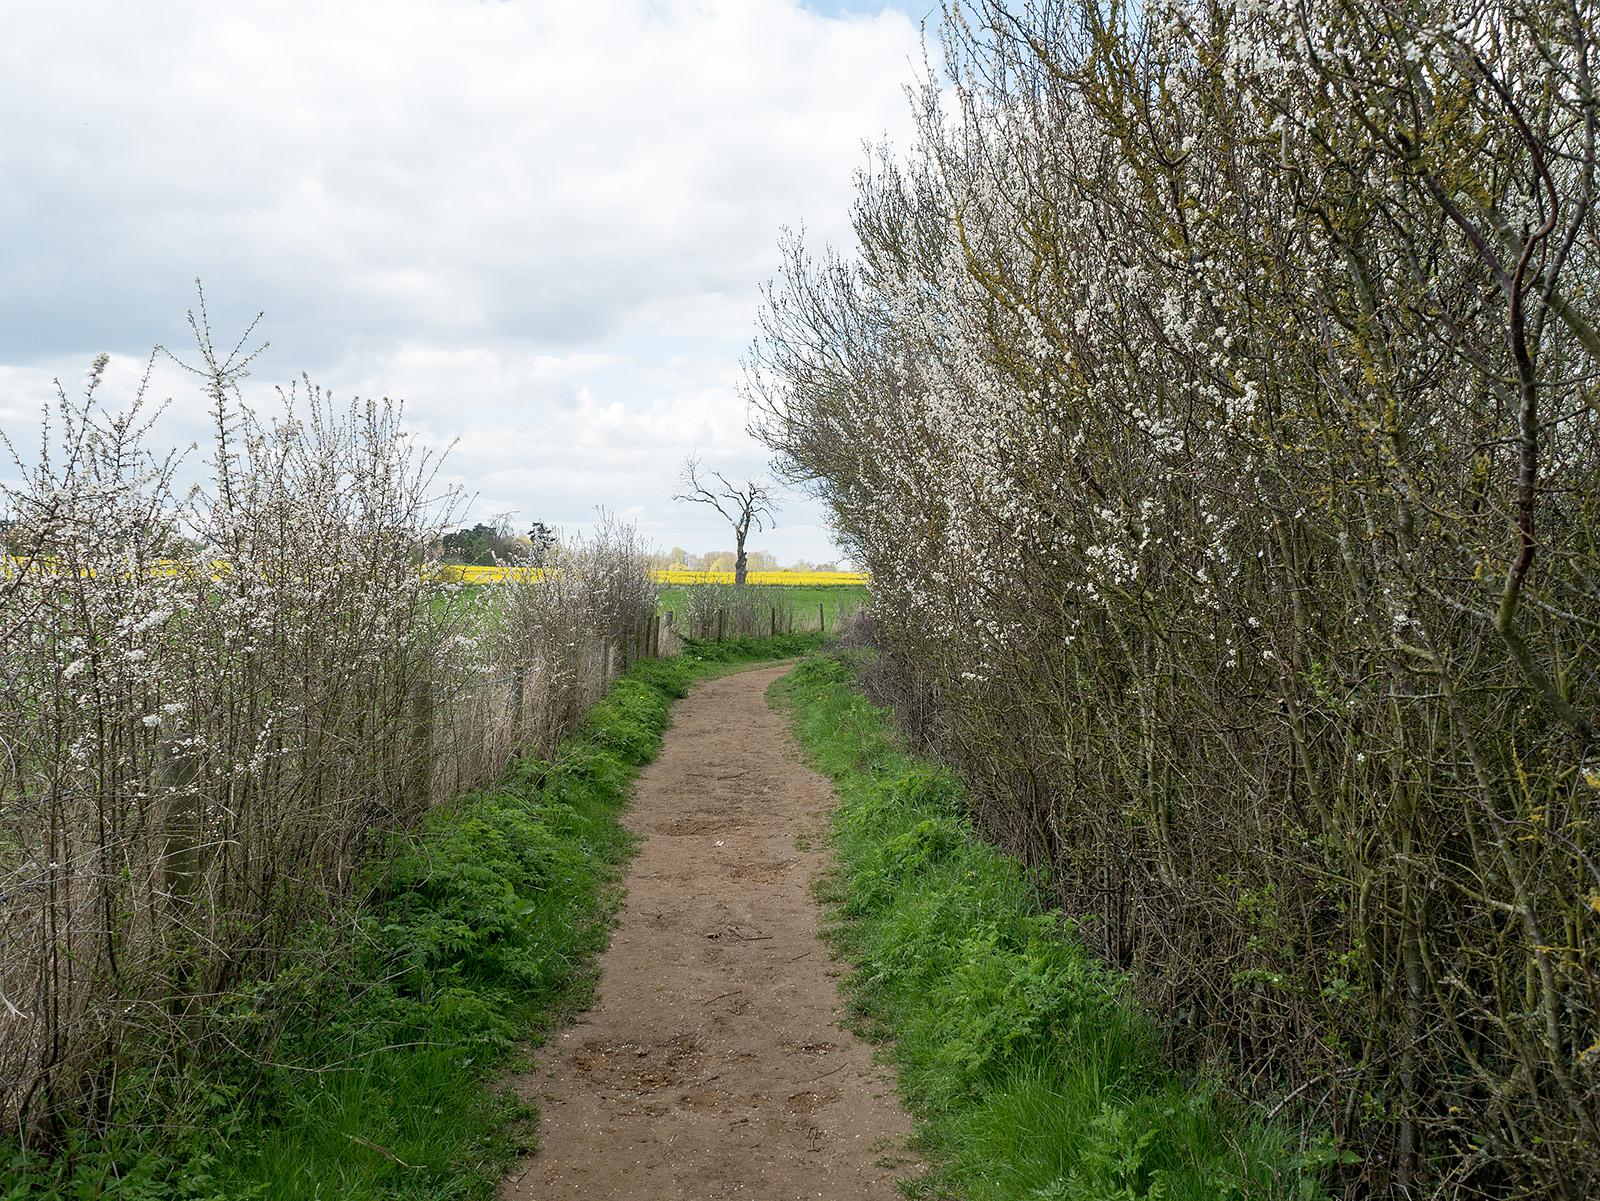 Springtime on the path.